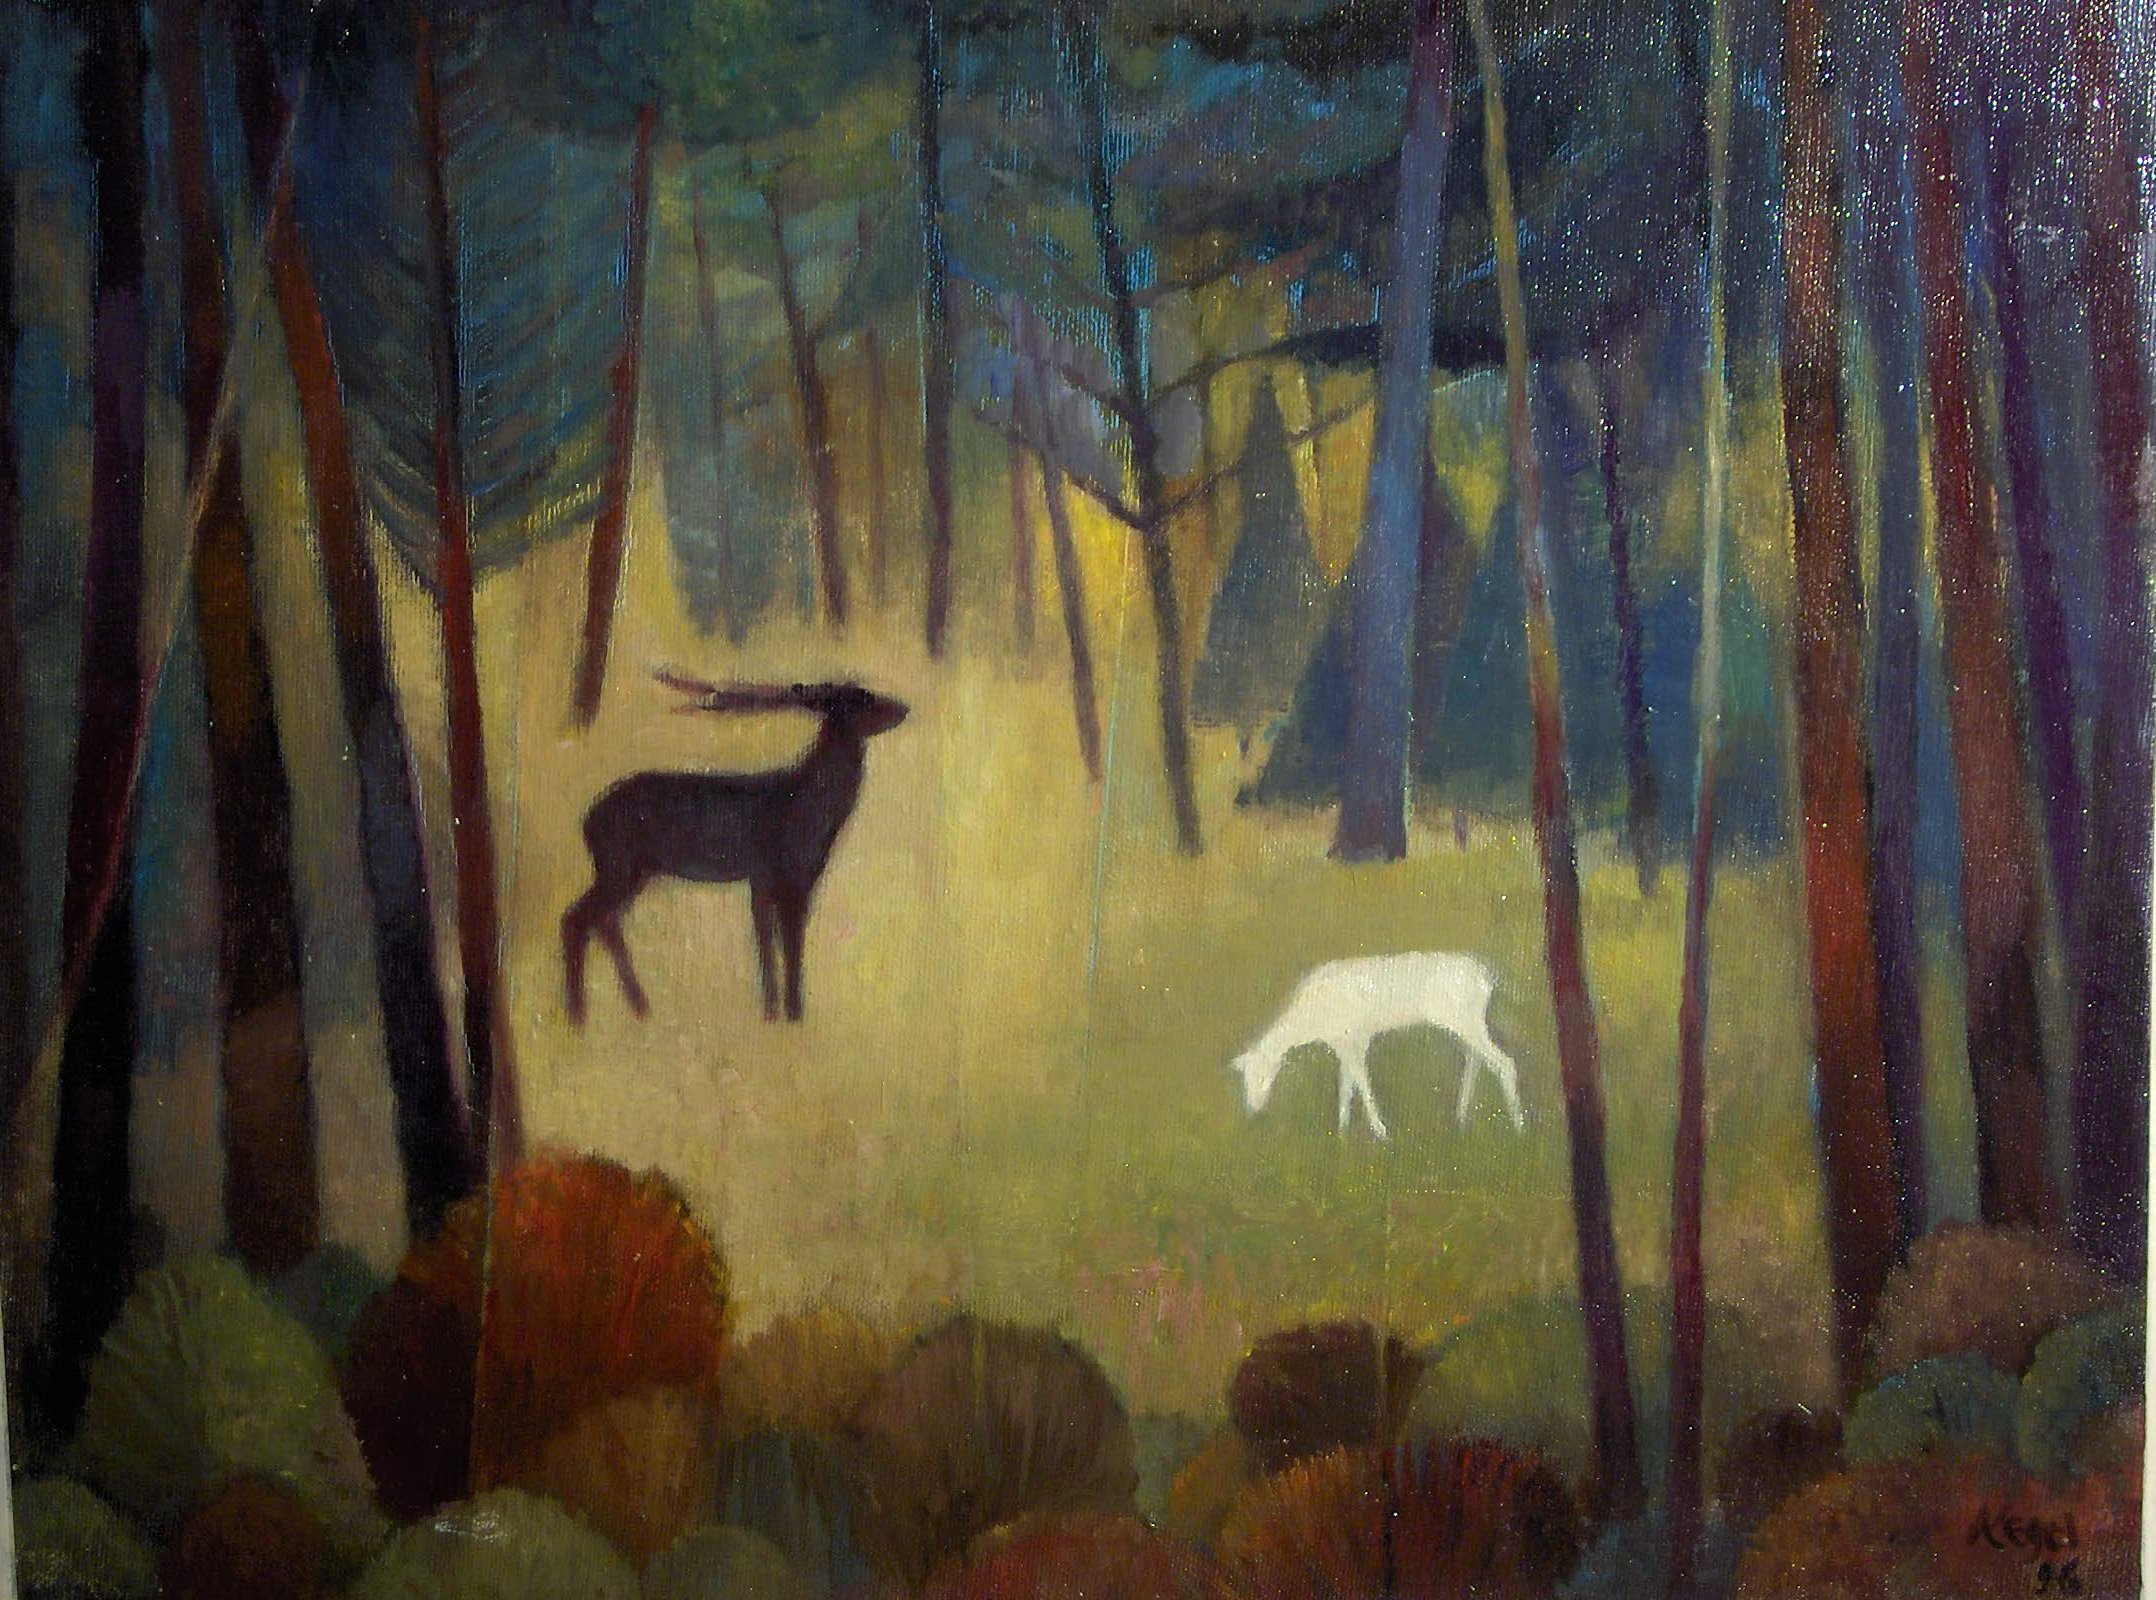 Pin Tiere Im Wald on Pinterest